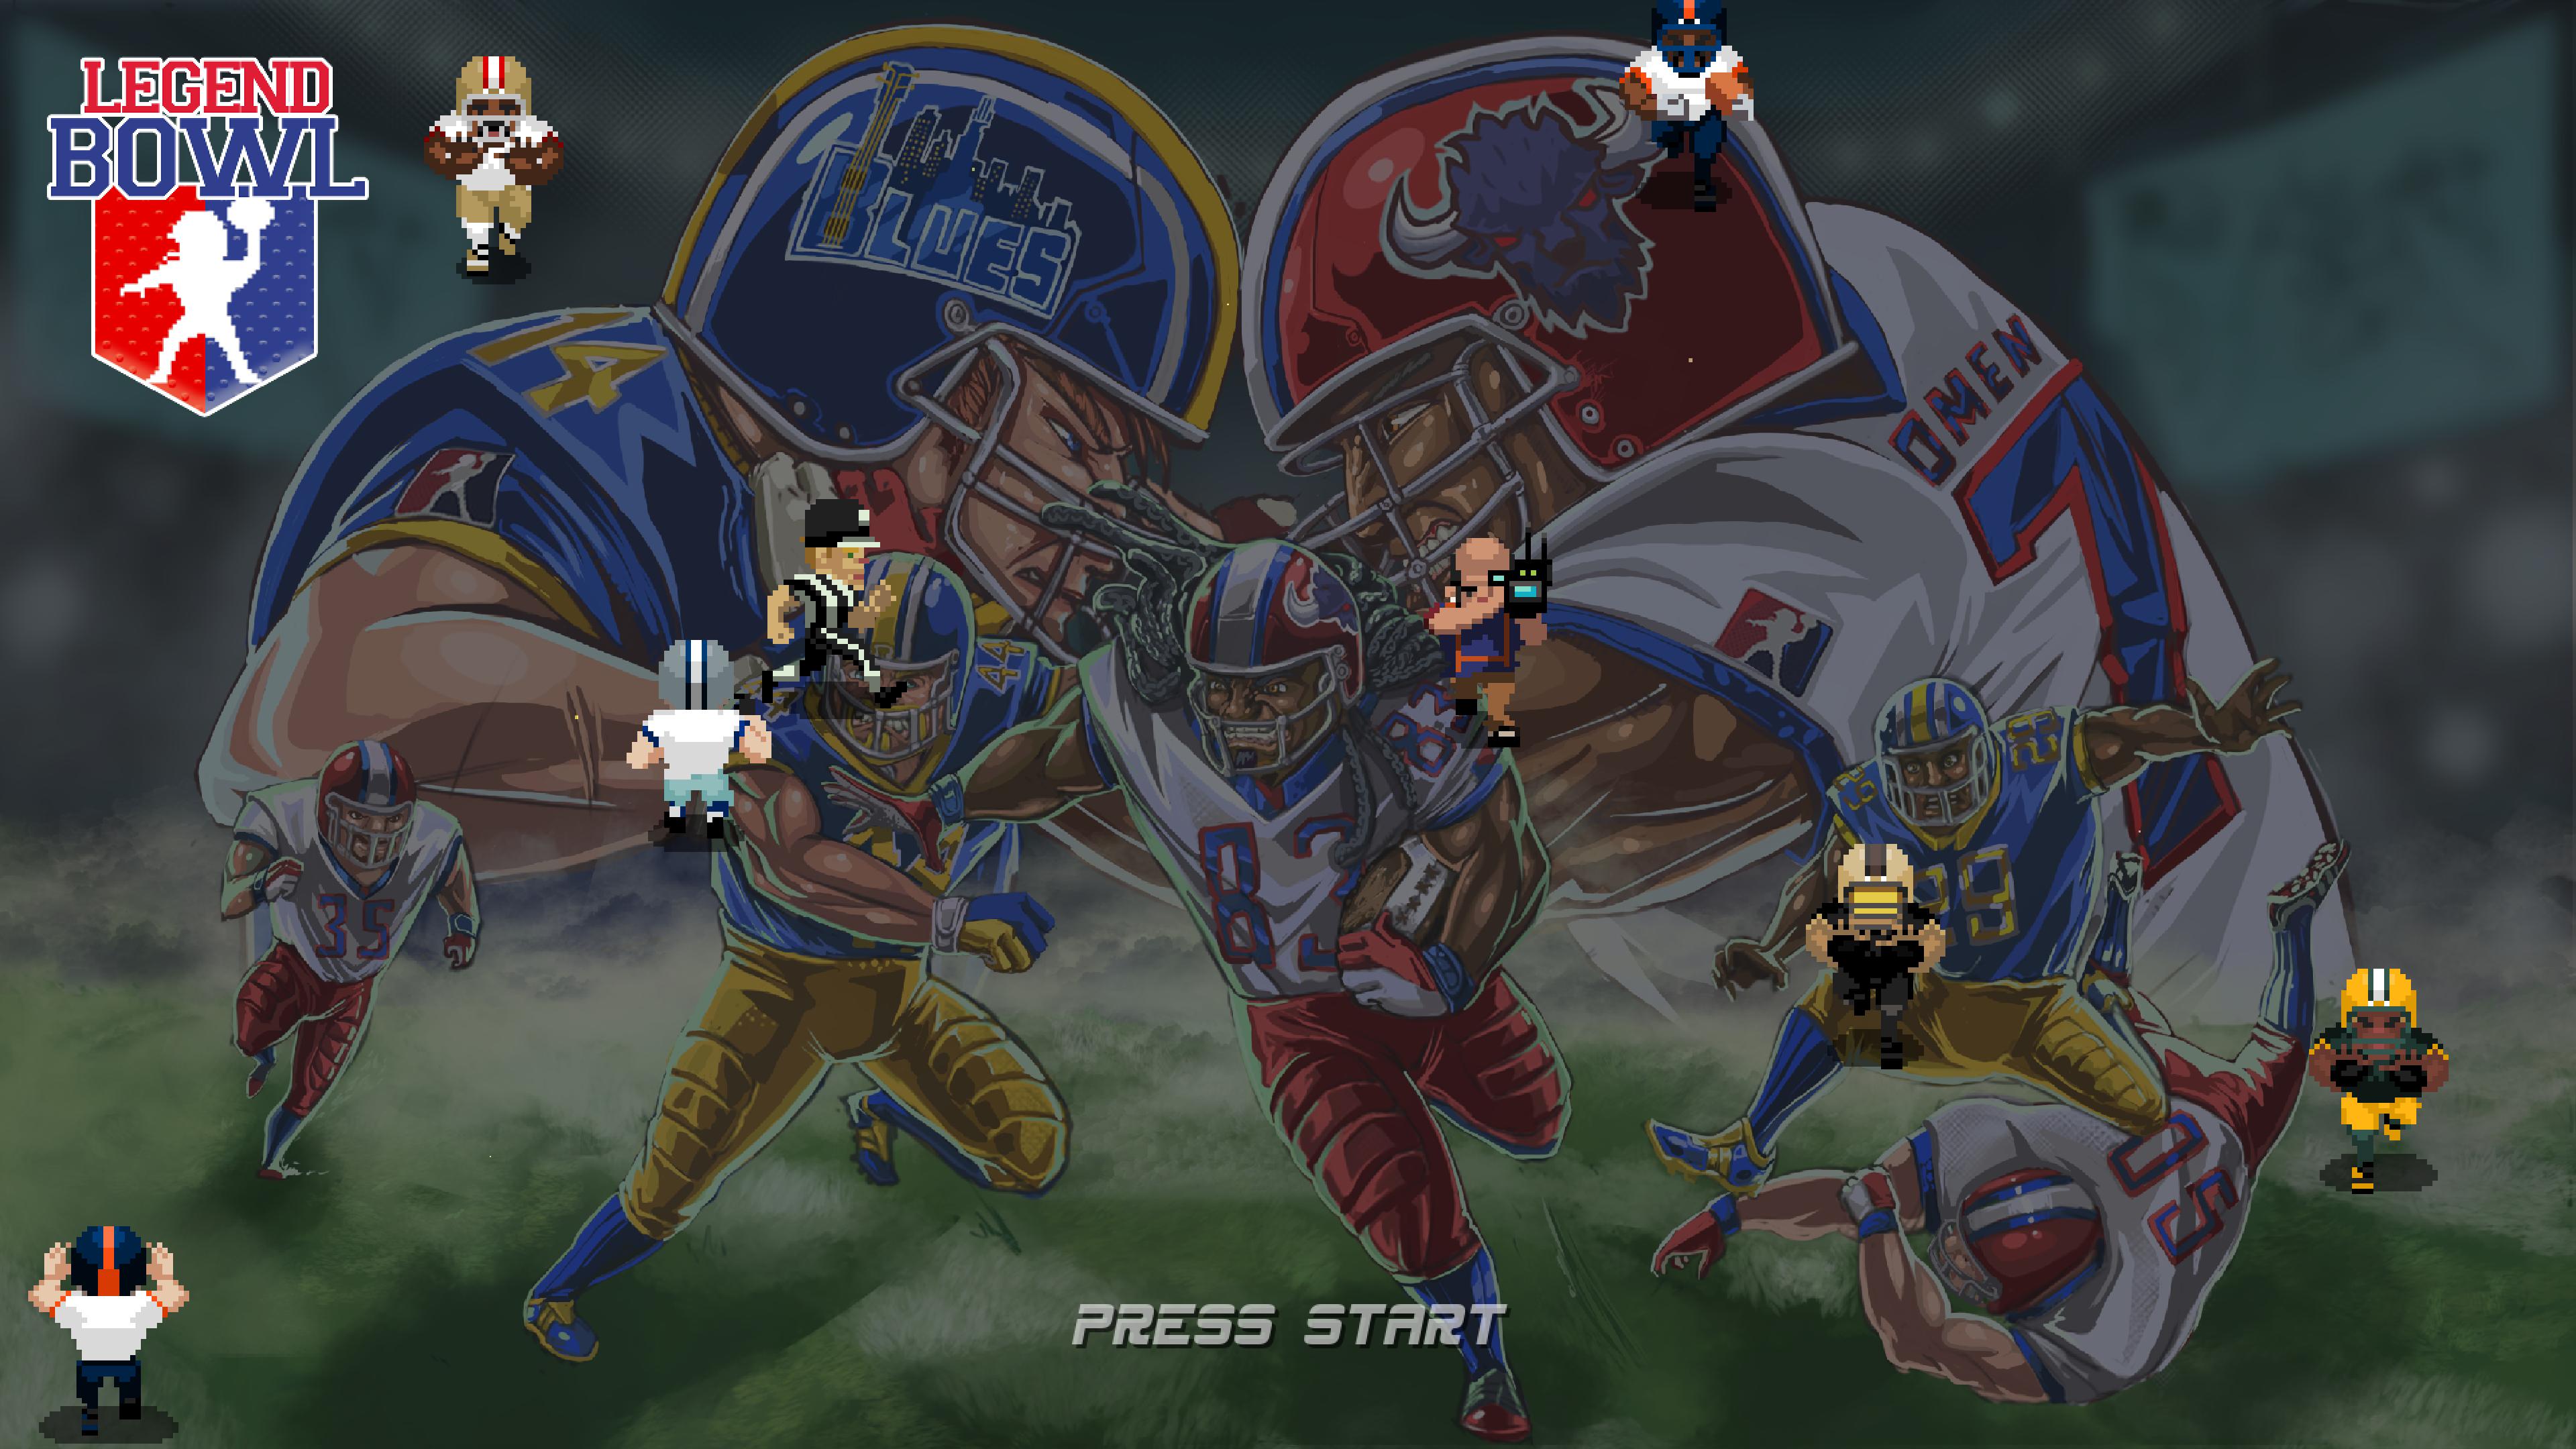 Legend Bowl Screenshot 2021.09.08 - 16.57.31.87